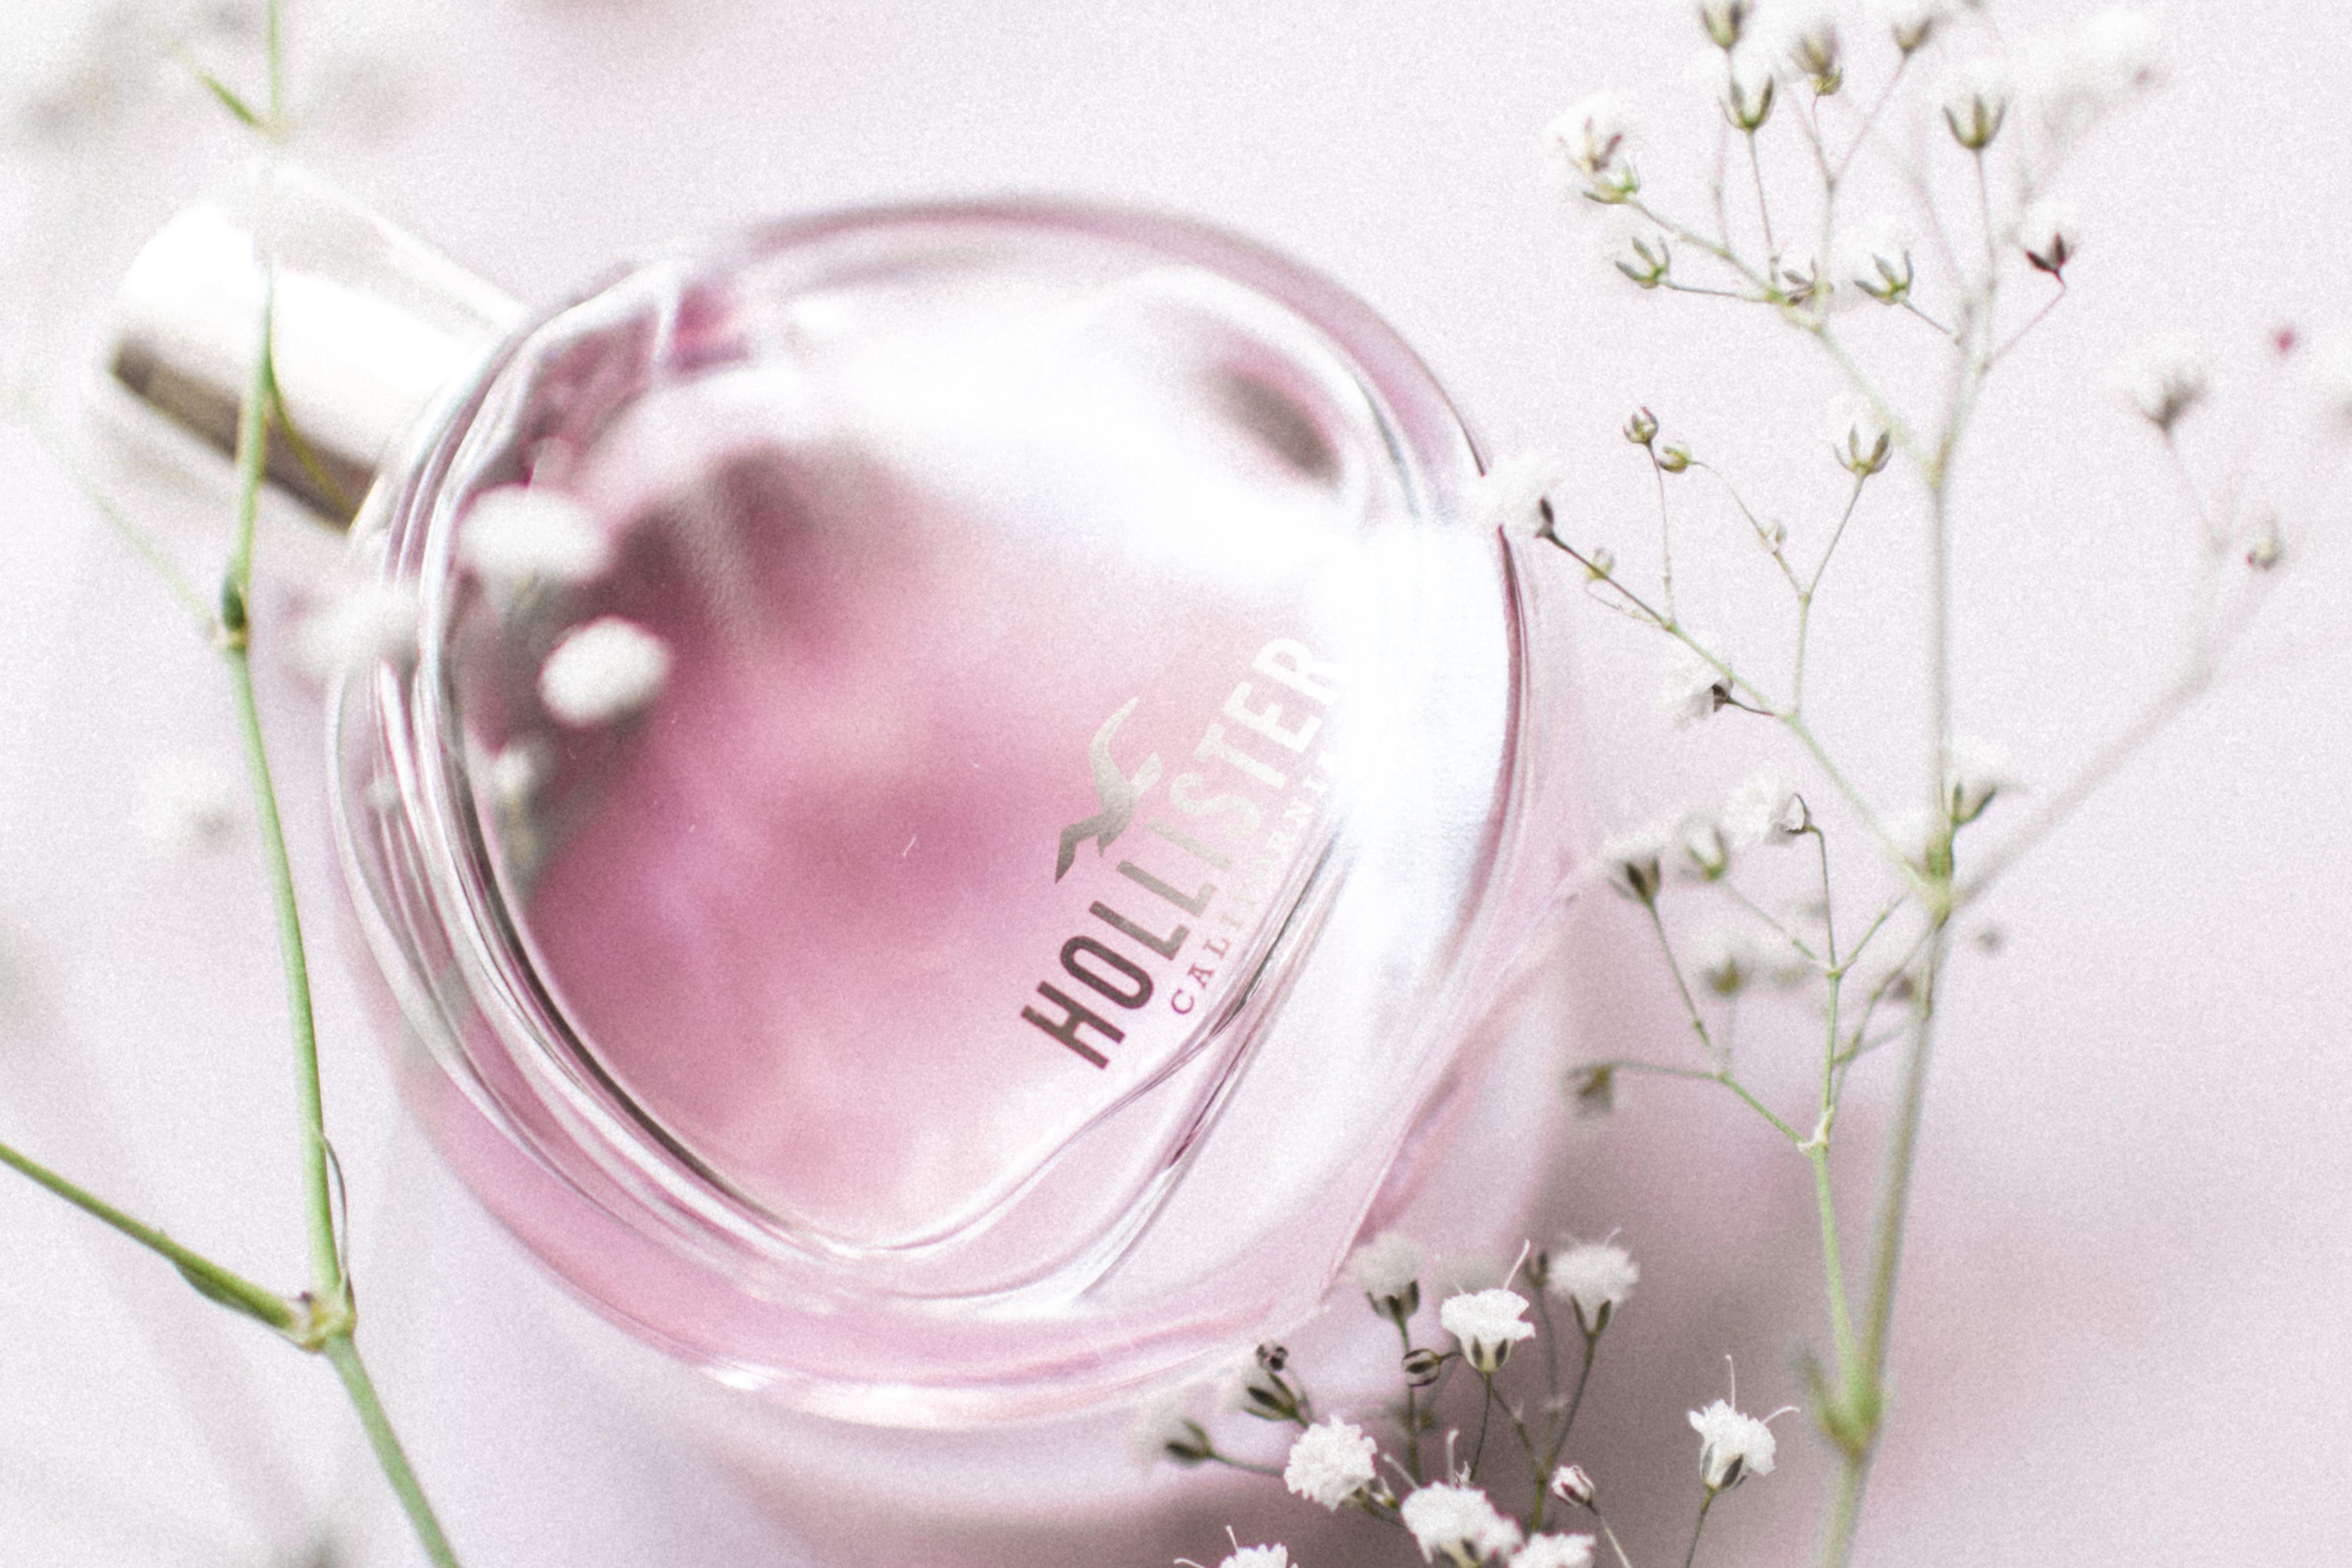 Hollister Perfume Bottle